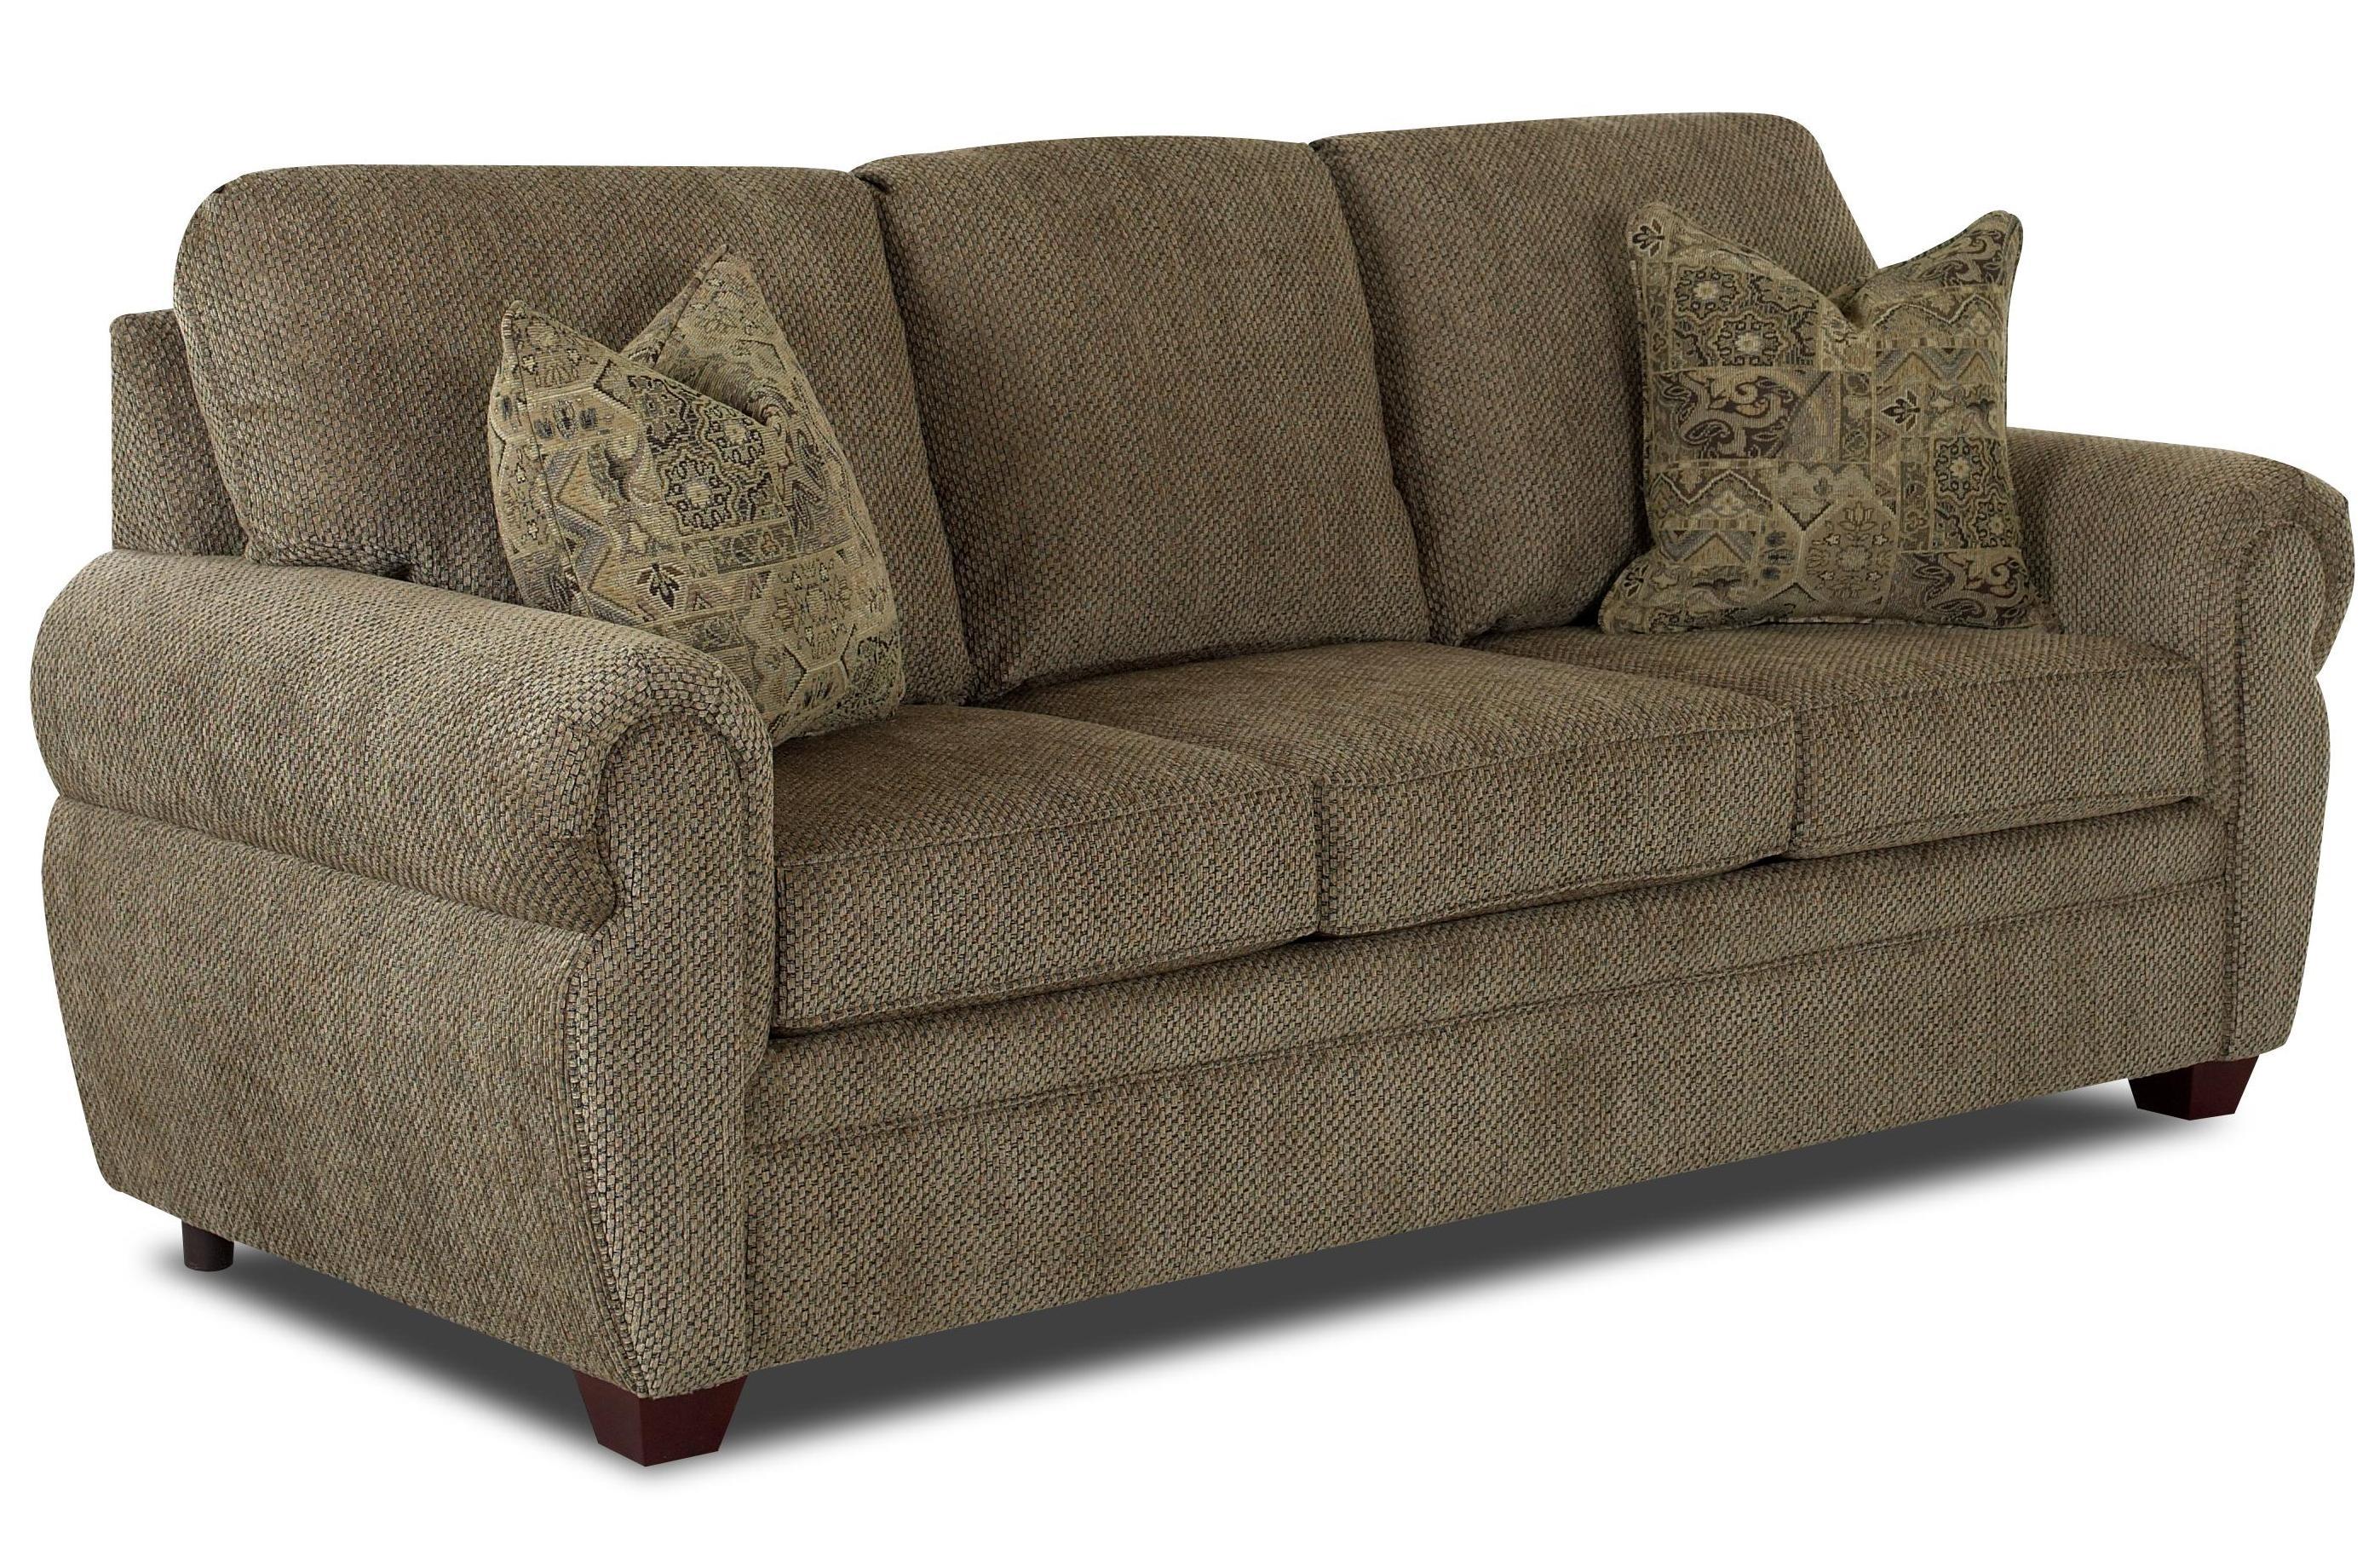 Klaussner Westbrook Rolled Arm Sofa Steger S Furniture